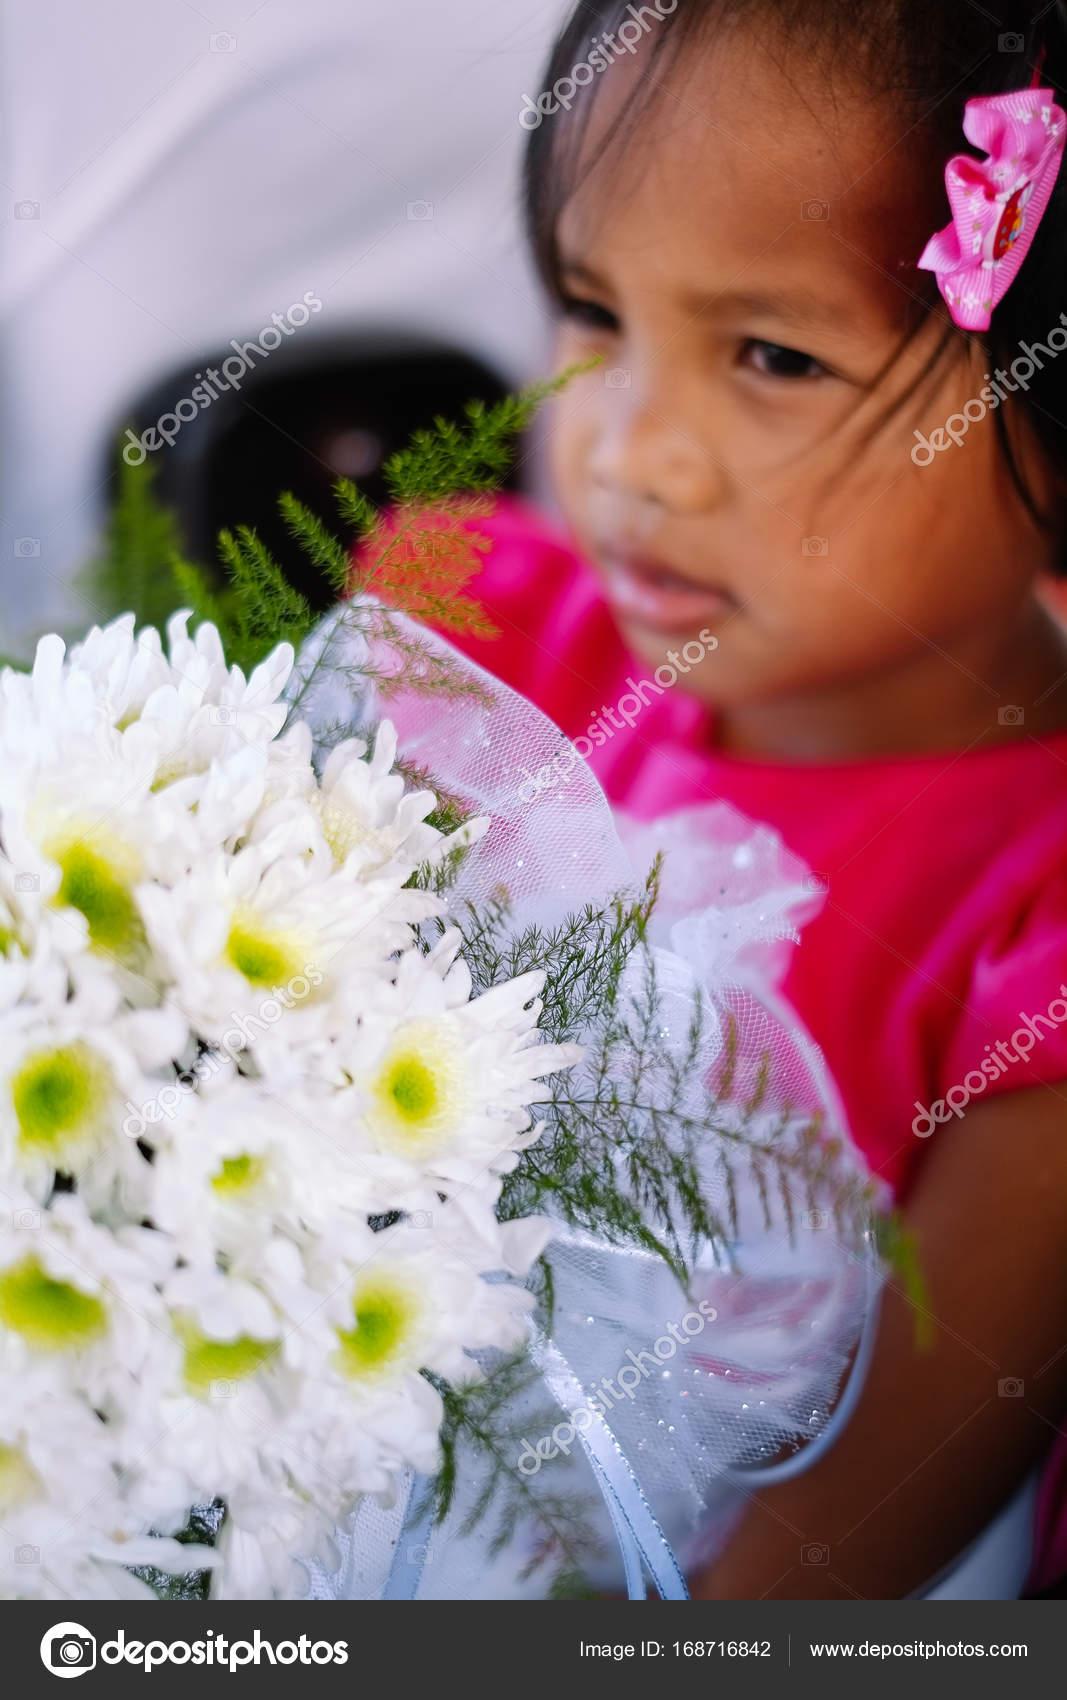 87a8c52d8103 Χαριτωμένο κοριτσάκι σε ροζ φόρεμα κρατώντας λευκά λουλούδια μπουκέτο σε  γαμήλια γιορτή. Κοριτσάκι λουλουδιών στο γάμο — Εικόνα από ...